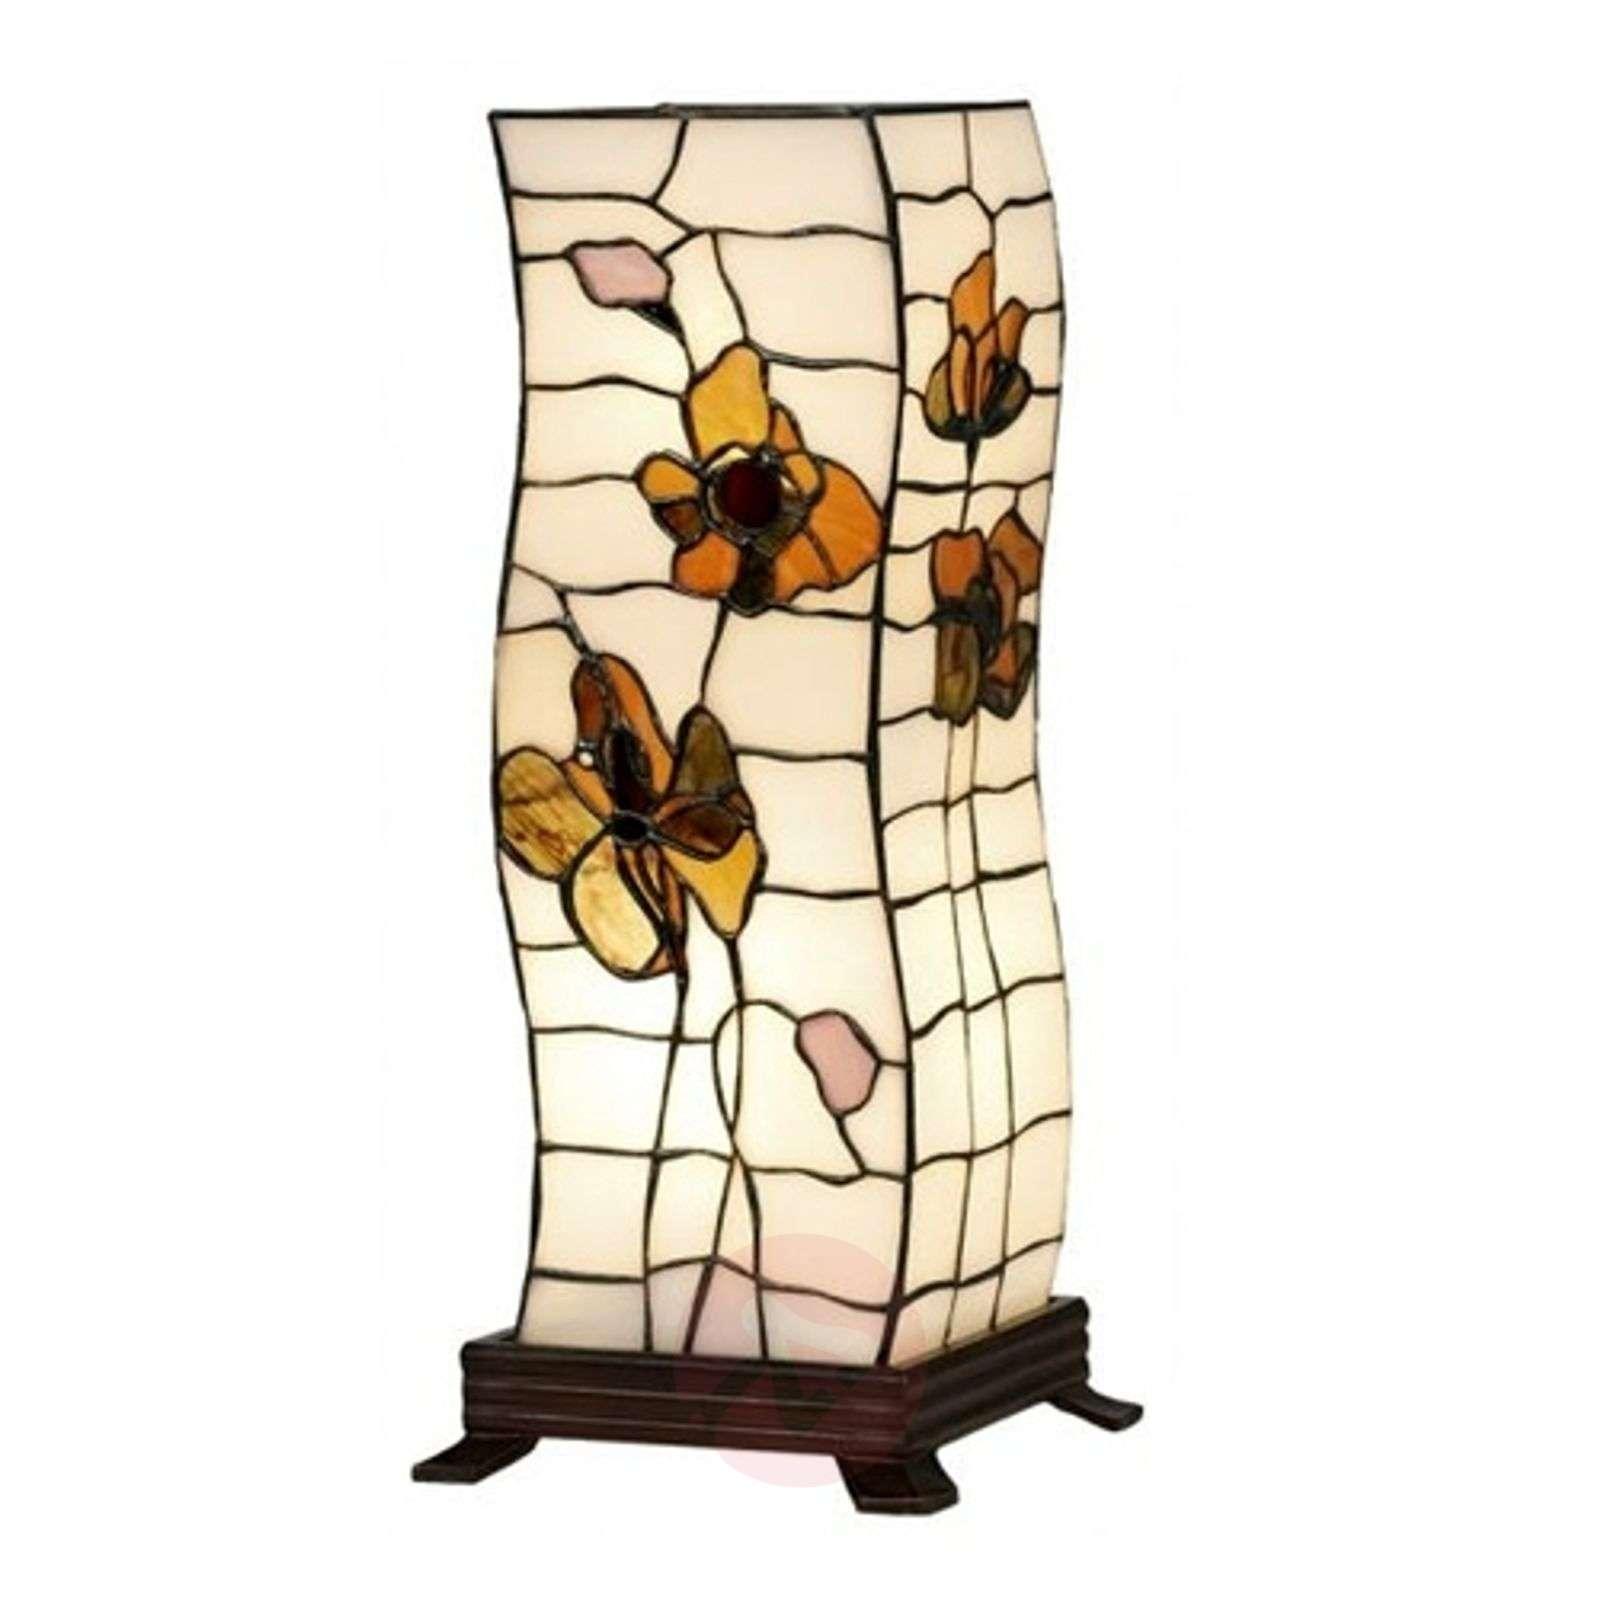 Tiffany-style table lamp Blossom-1032026-01